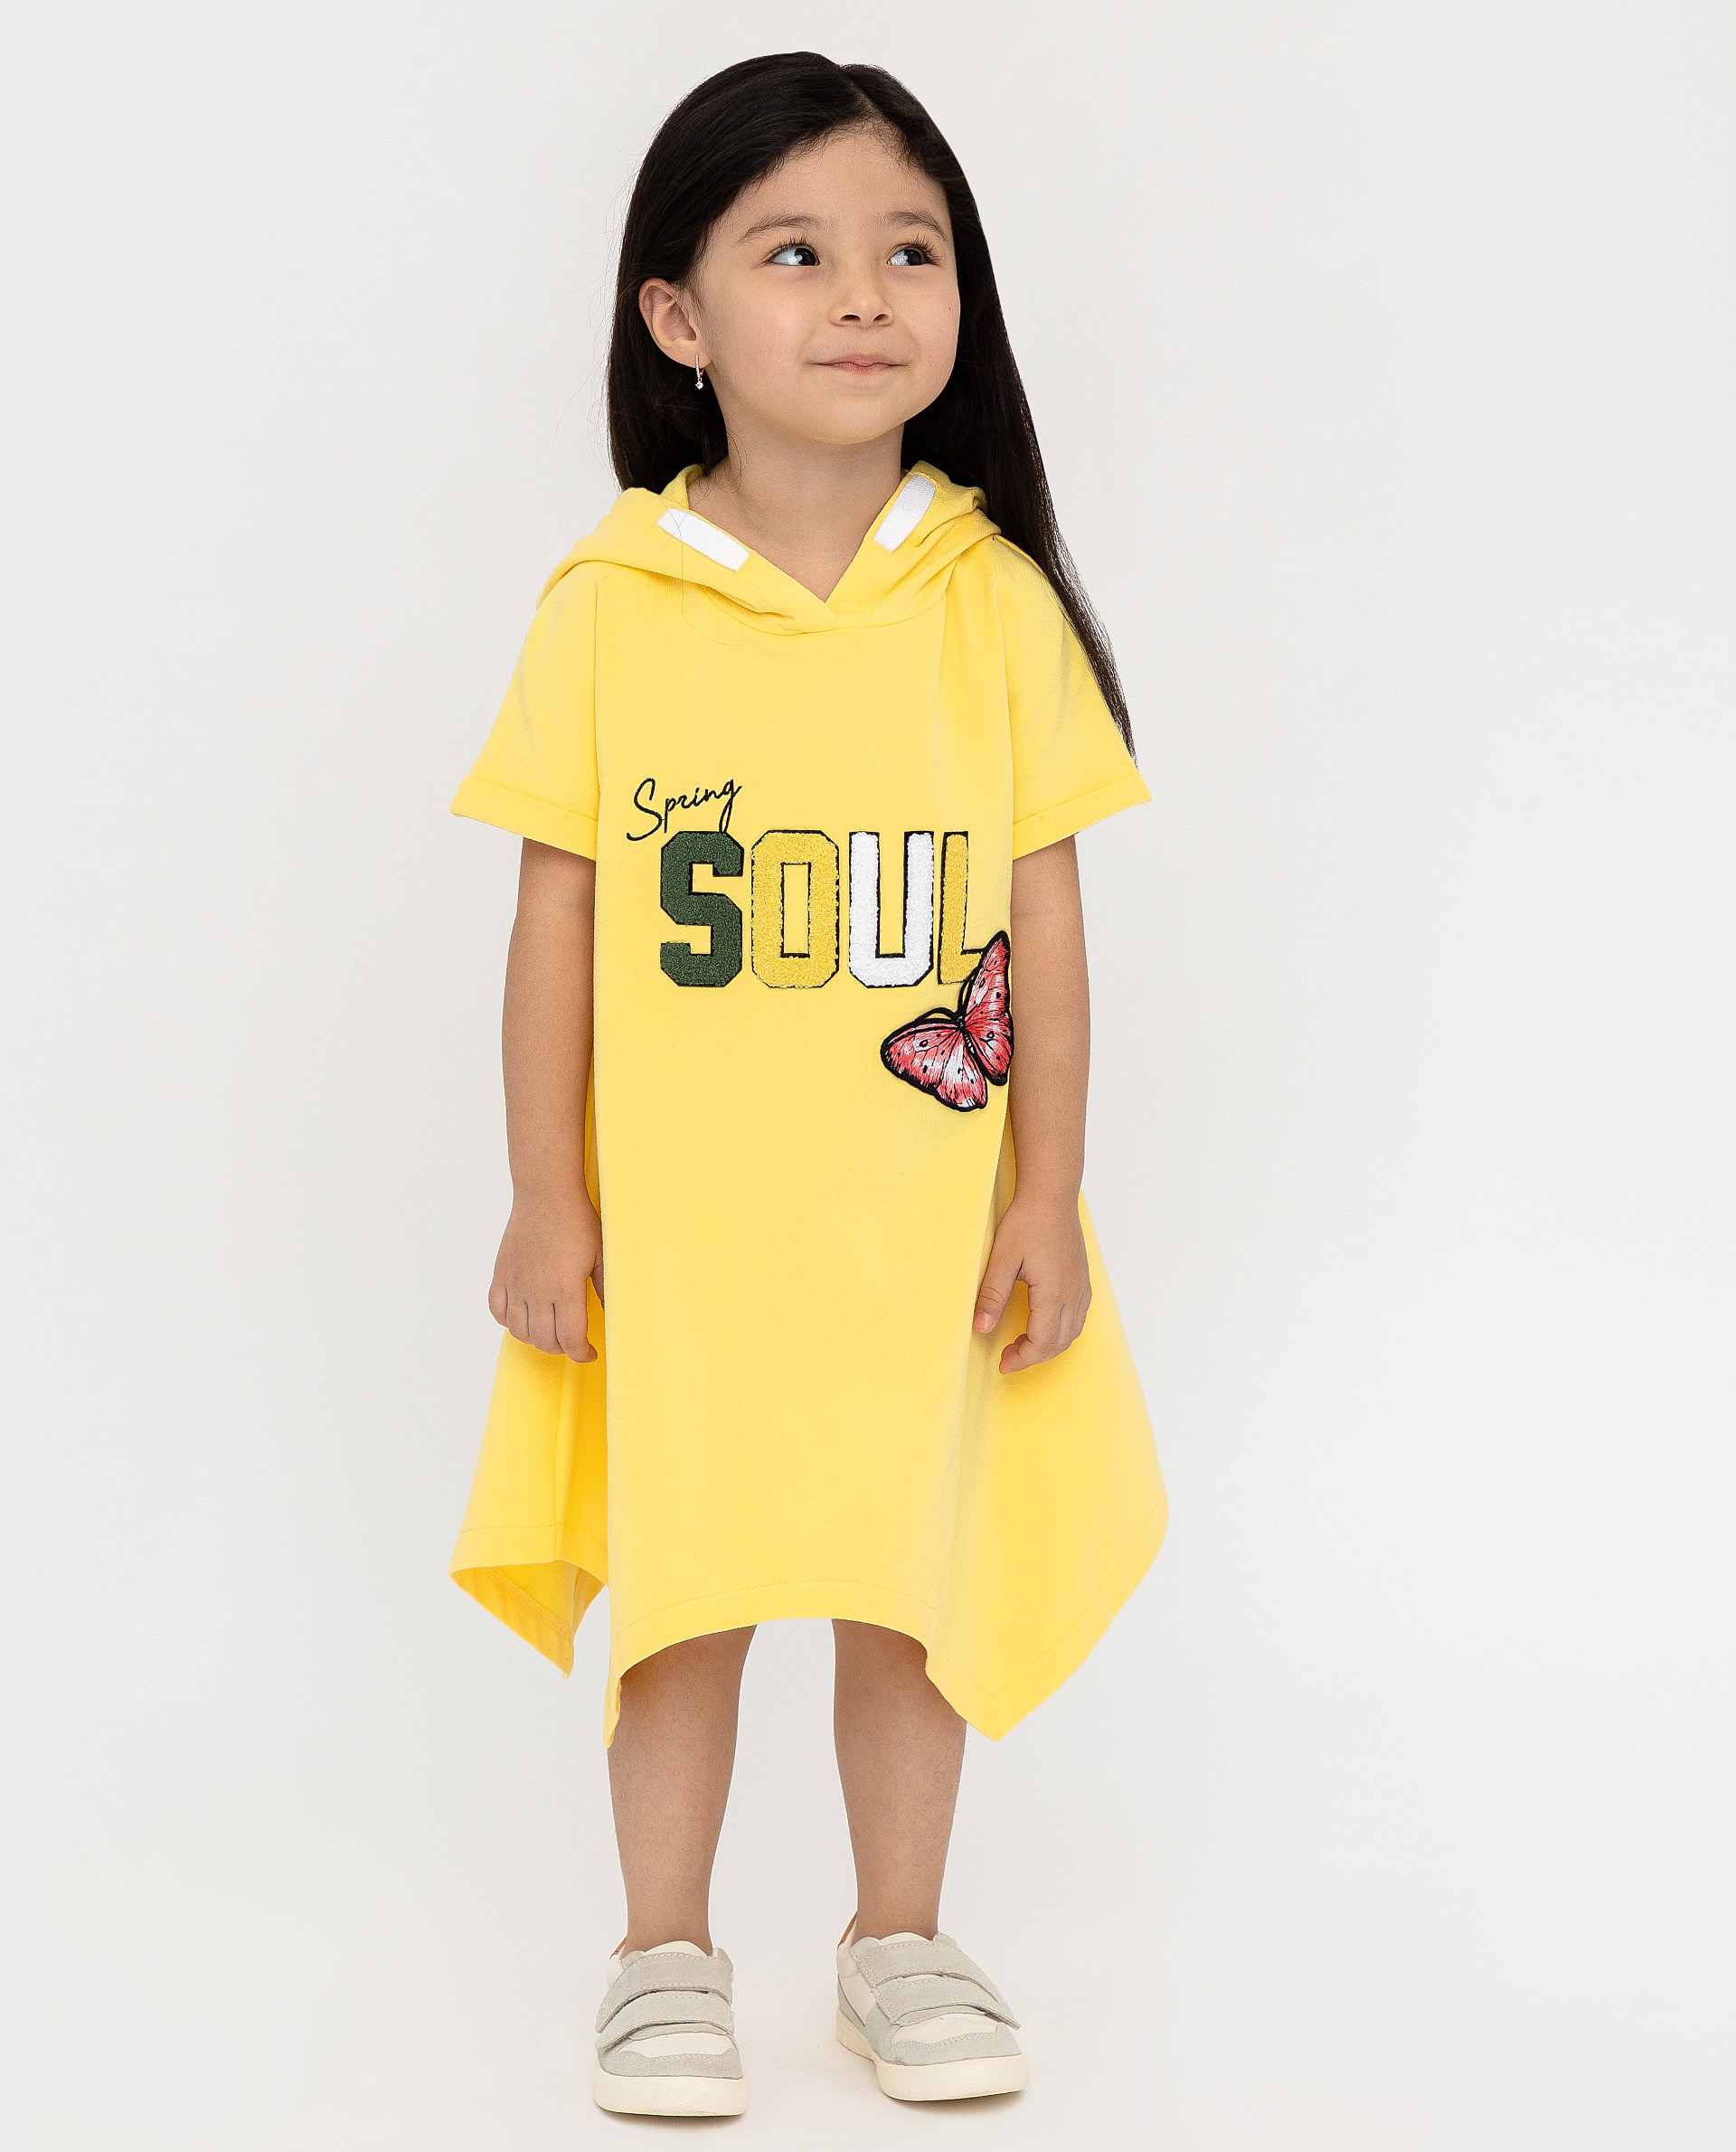 Купить 12002GMC5004, Желтое платье с капюшоном Gulliver, желтый, 116, Женский, ВЕСНА/ЛЕТО 2020 (shop: GulliverMarket Gulliver Market)